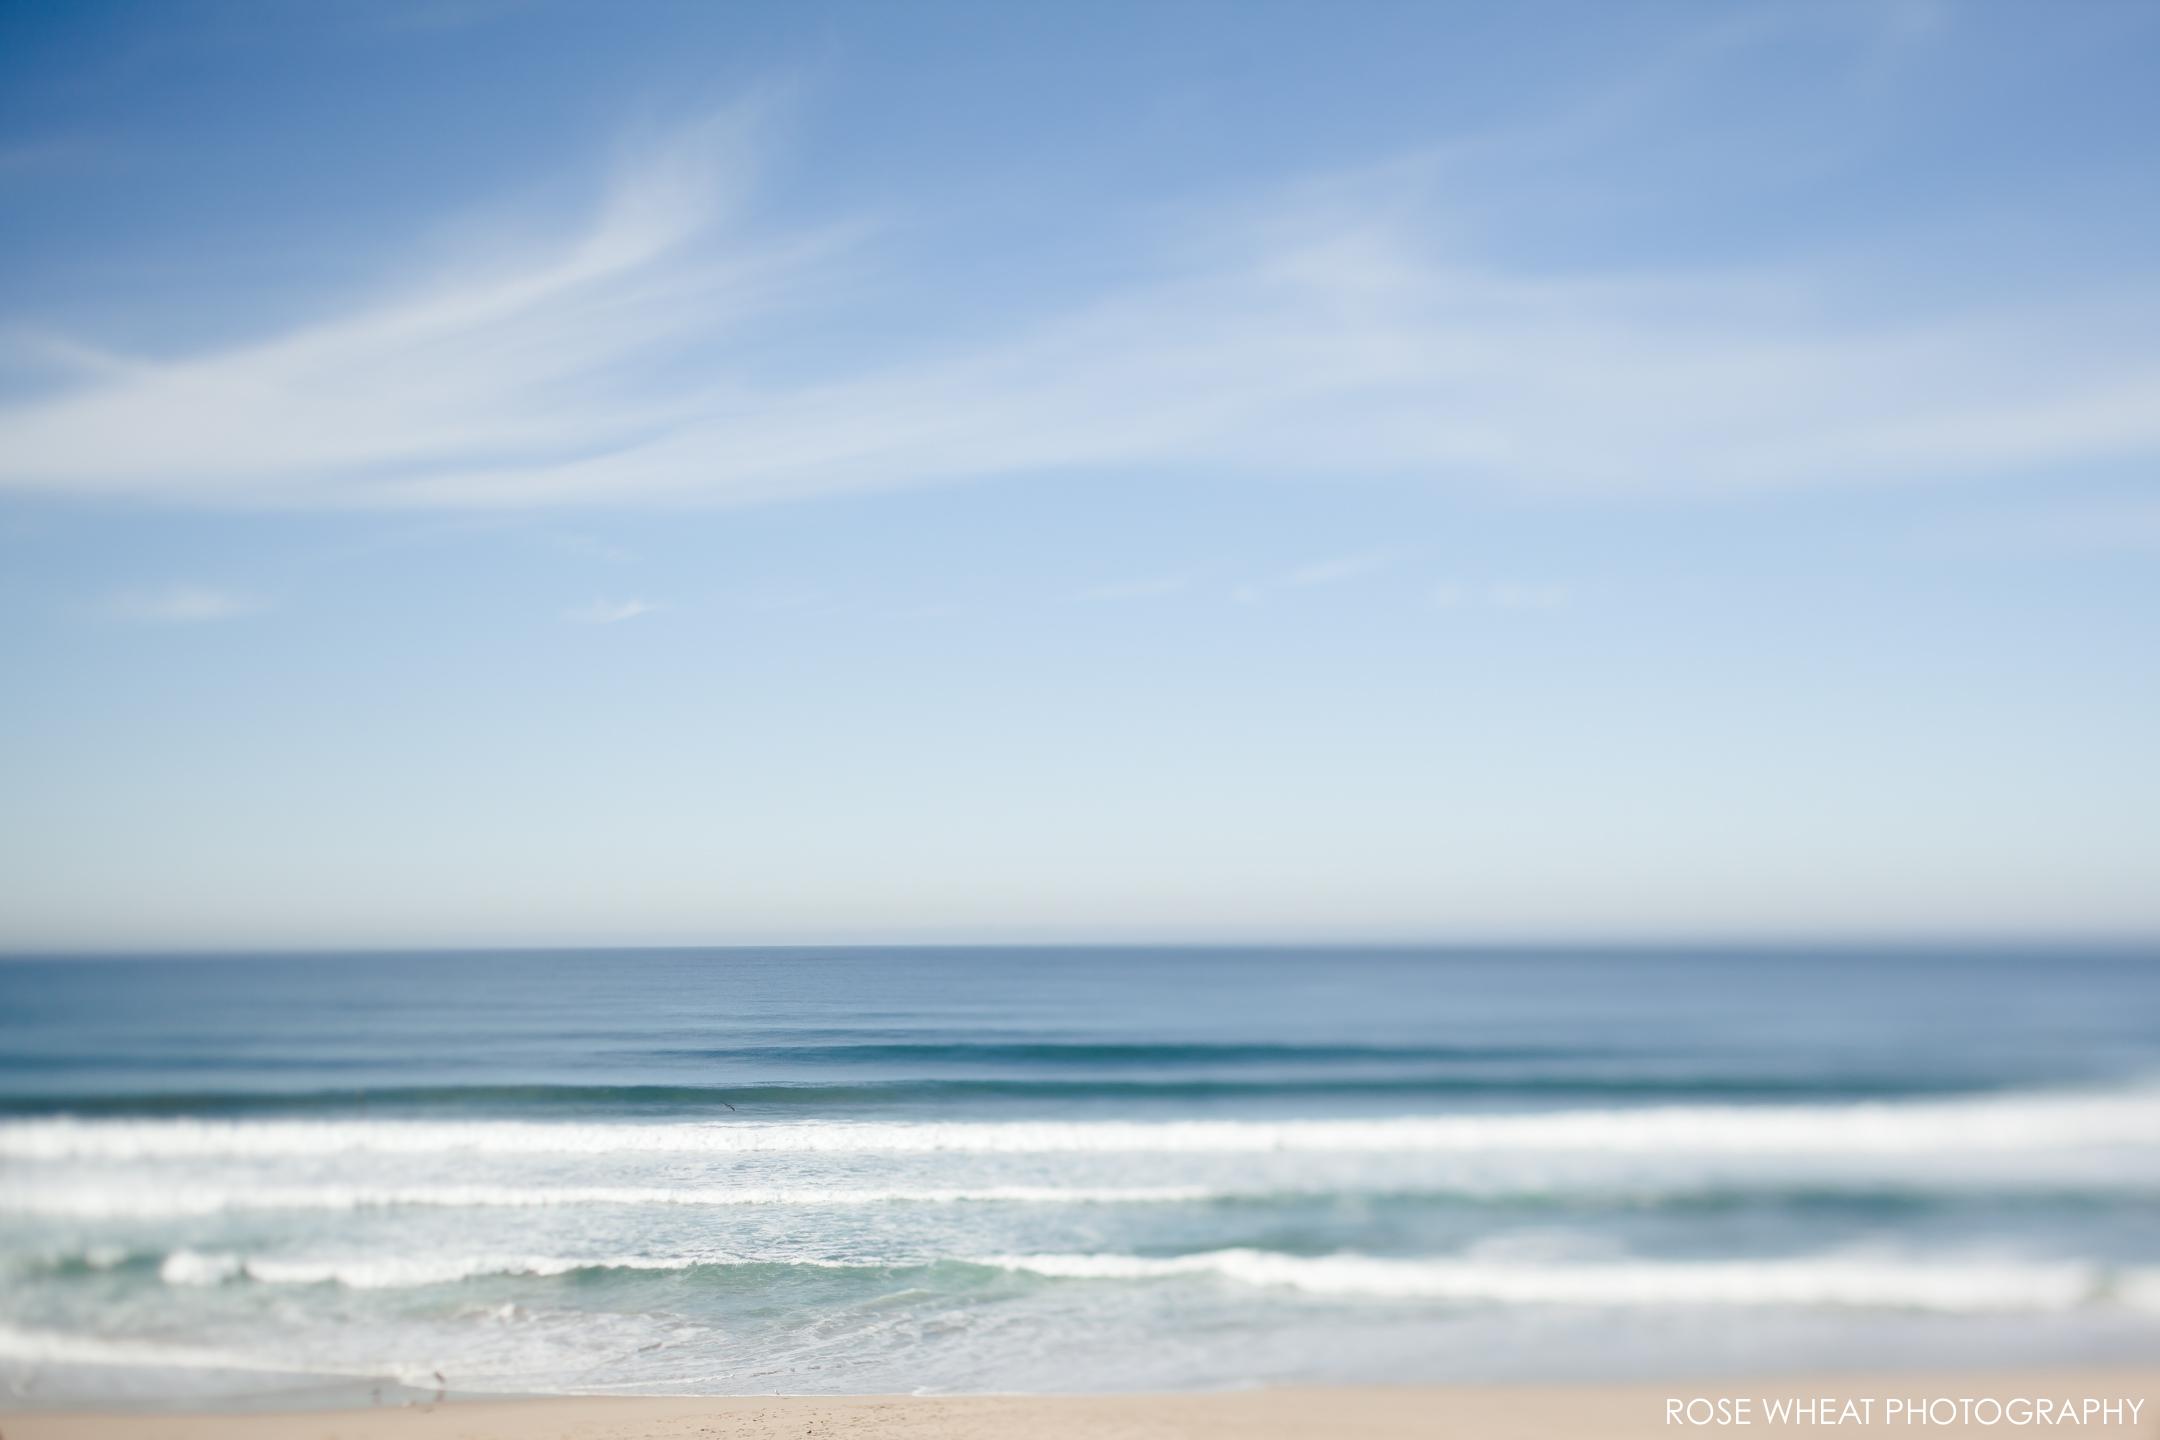 Salinas_Beach_Rose_Wheat_Photography.jpg